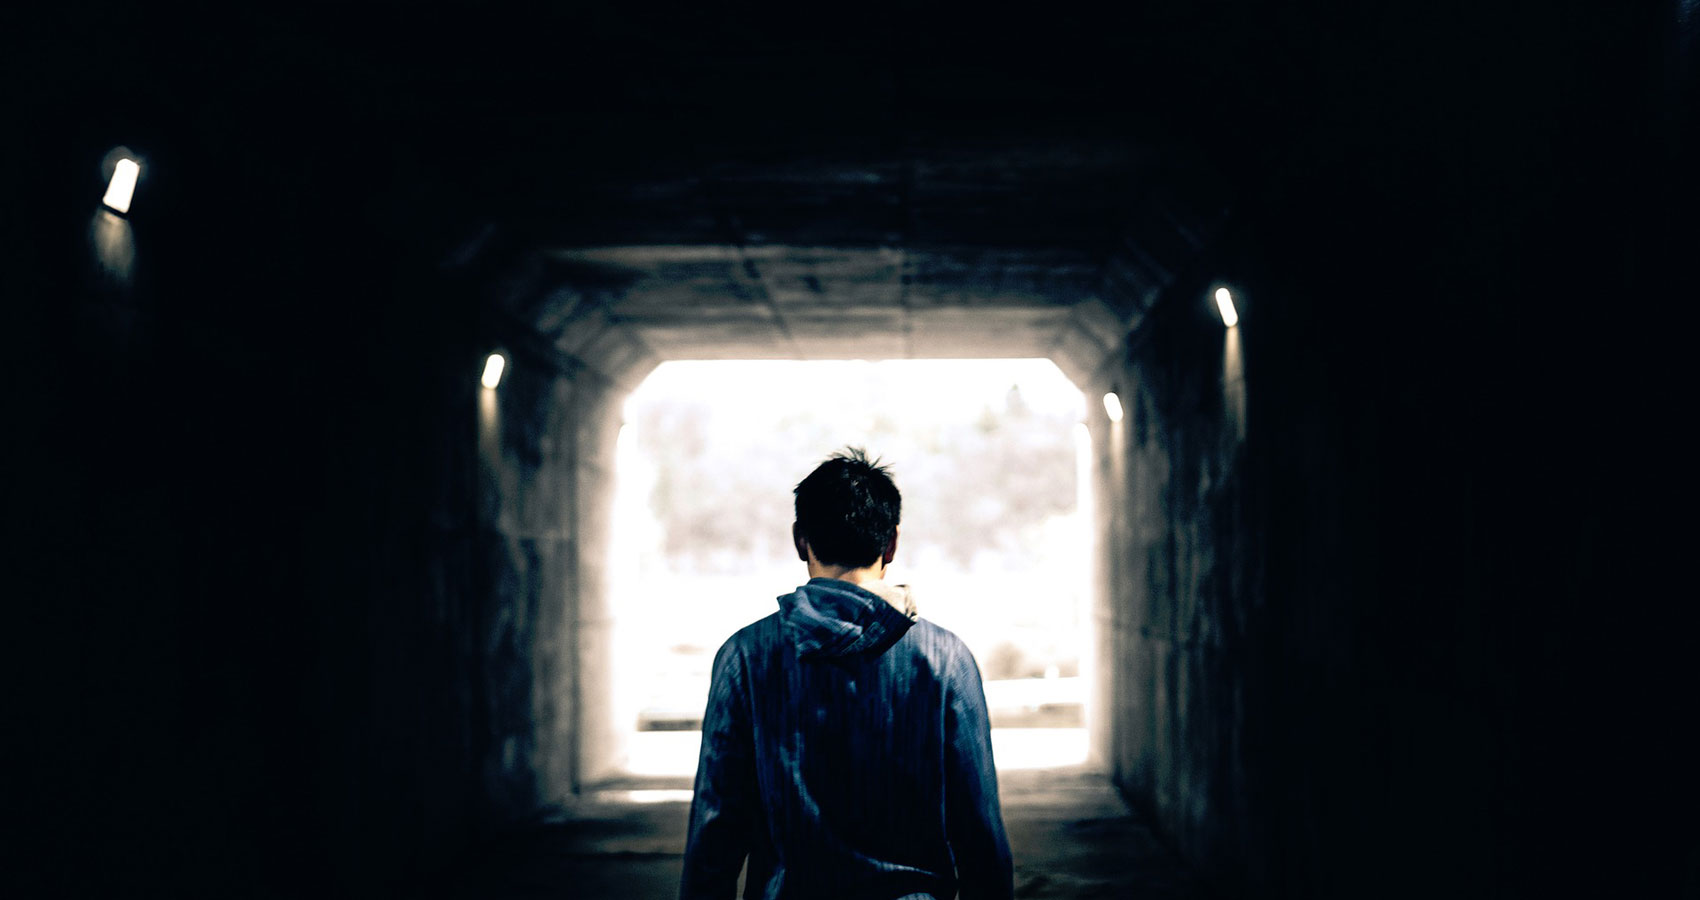 Walk Alone by Edward Mind at Spillwords.com